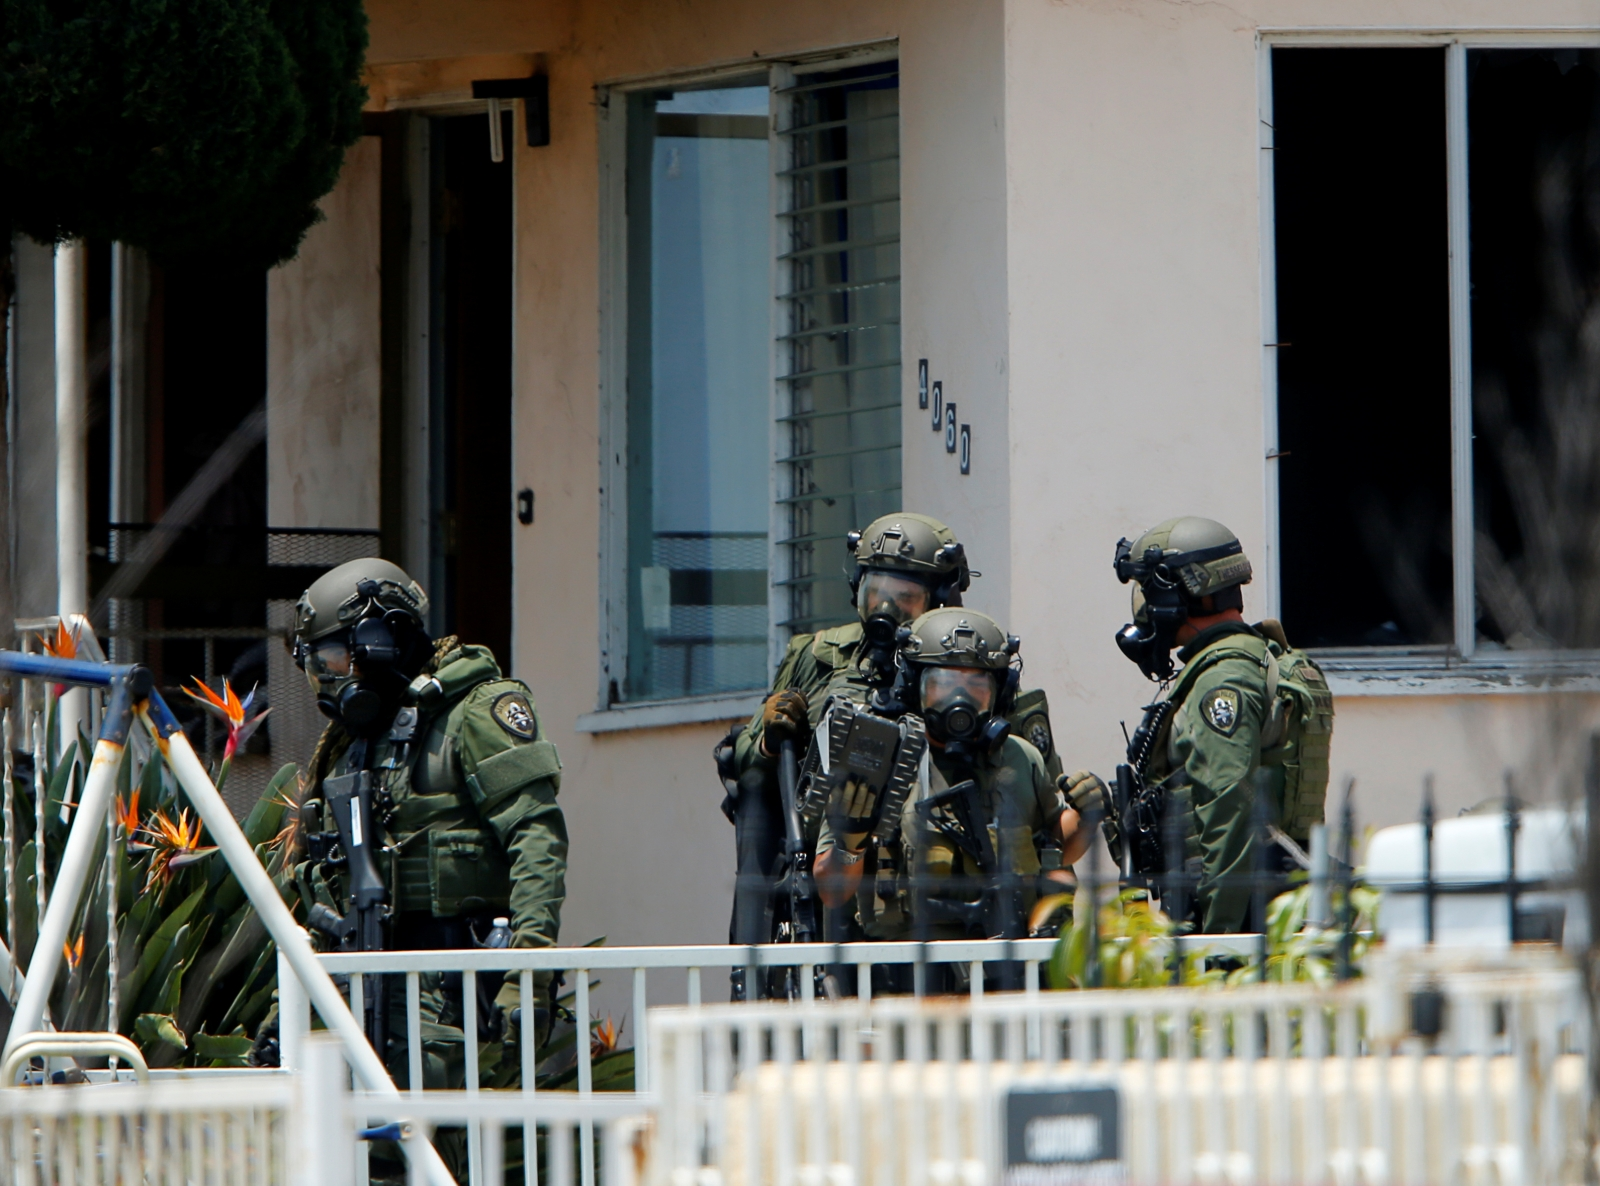 San Diego police shootings